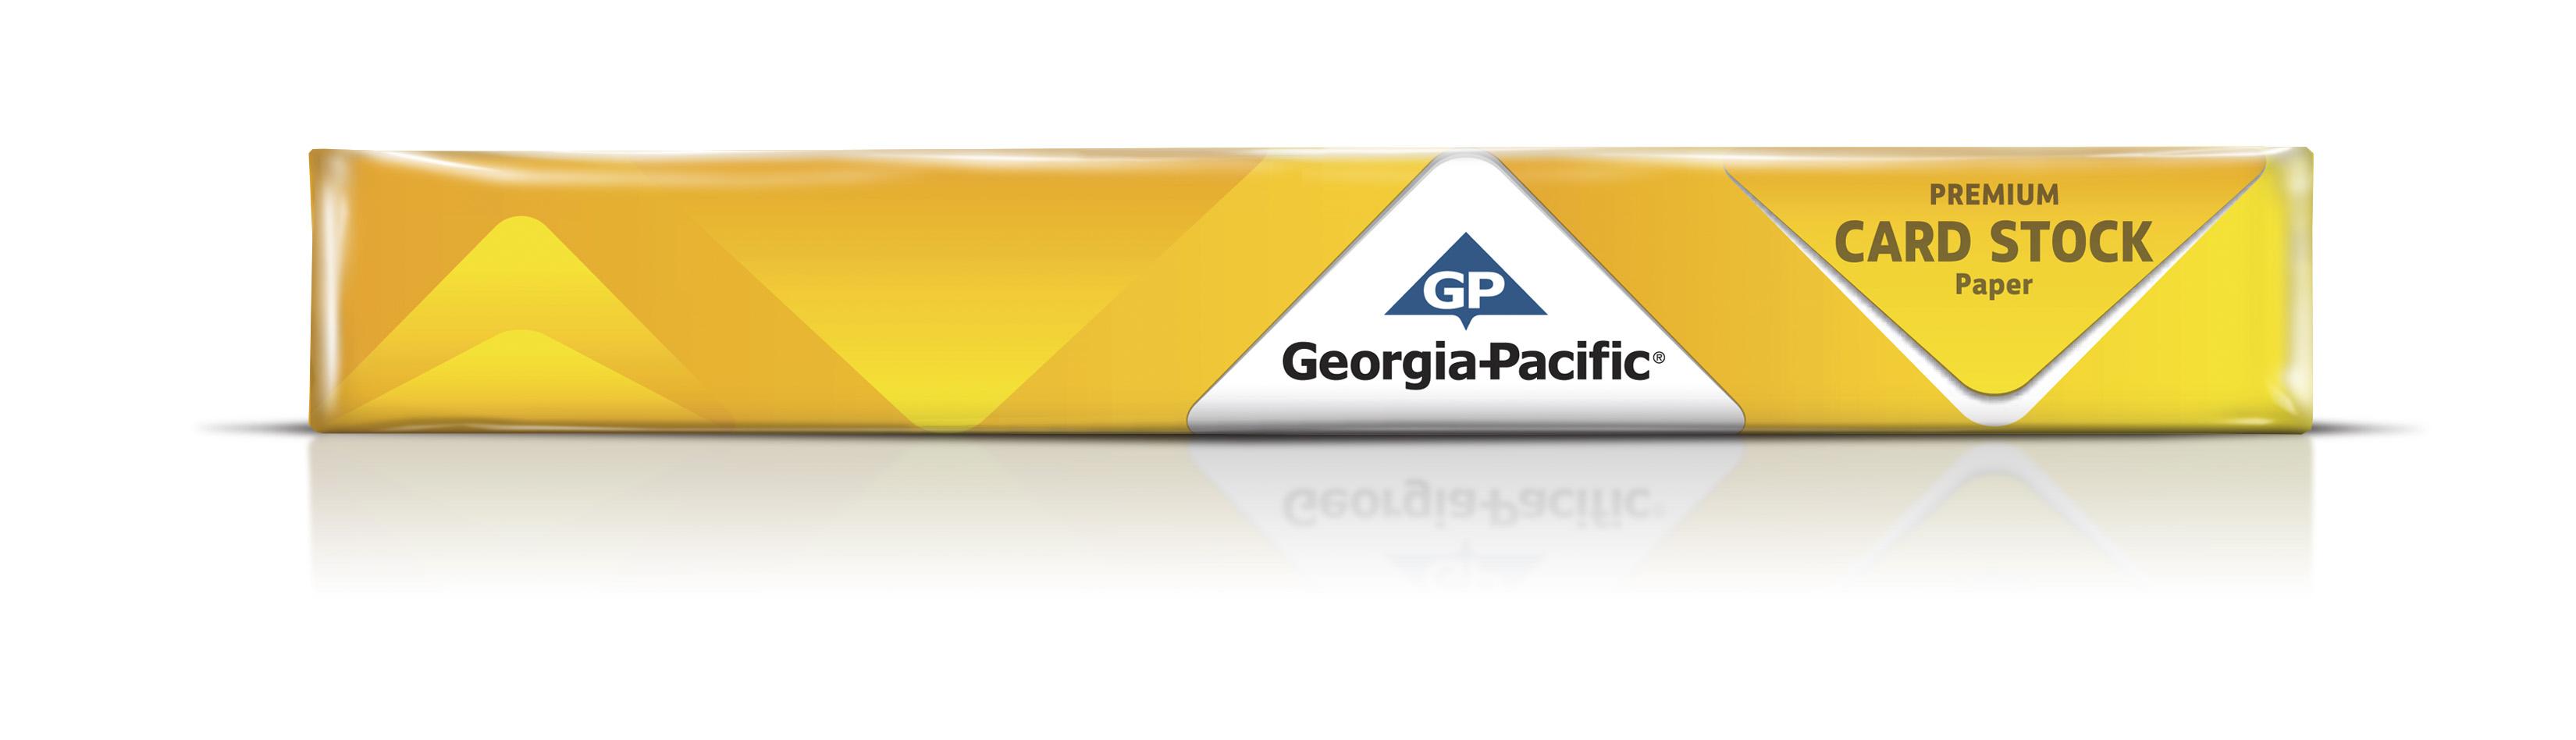 "Georgia-Pacific White Cardstock Paper, 8.5"" x 11"", 110 lb, 150 Sheets - Walmart.com"